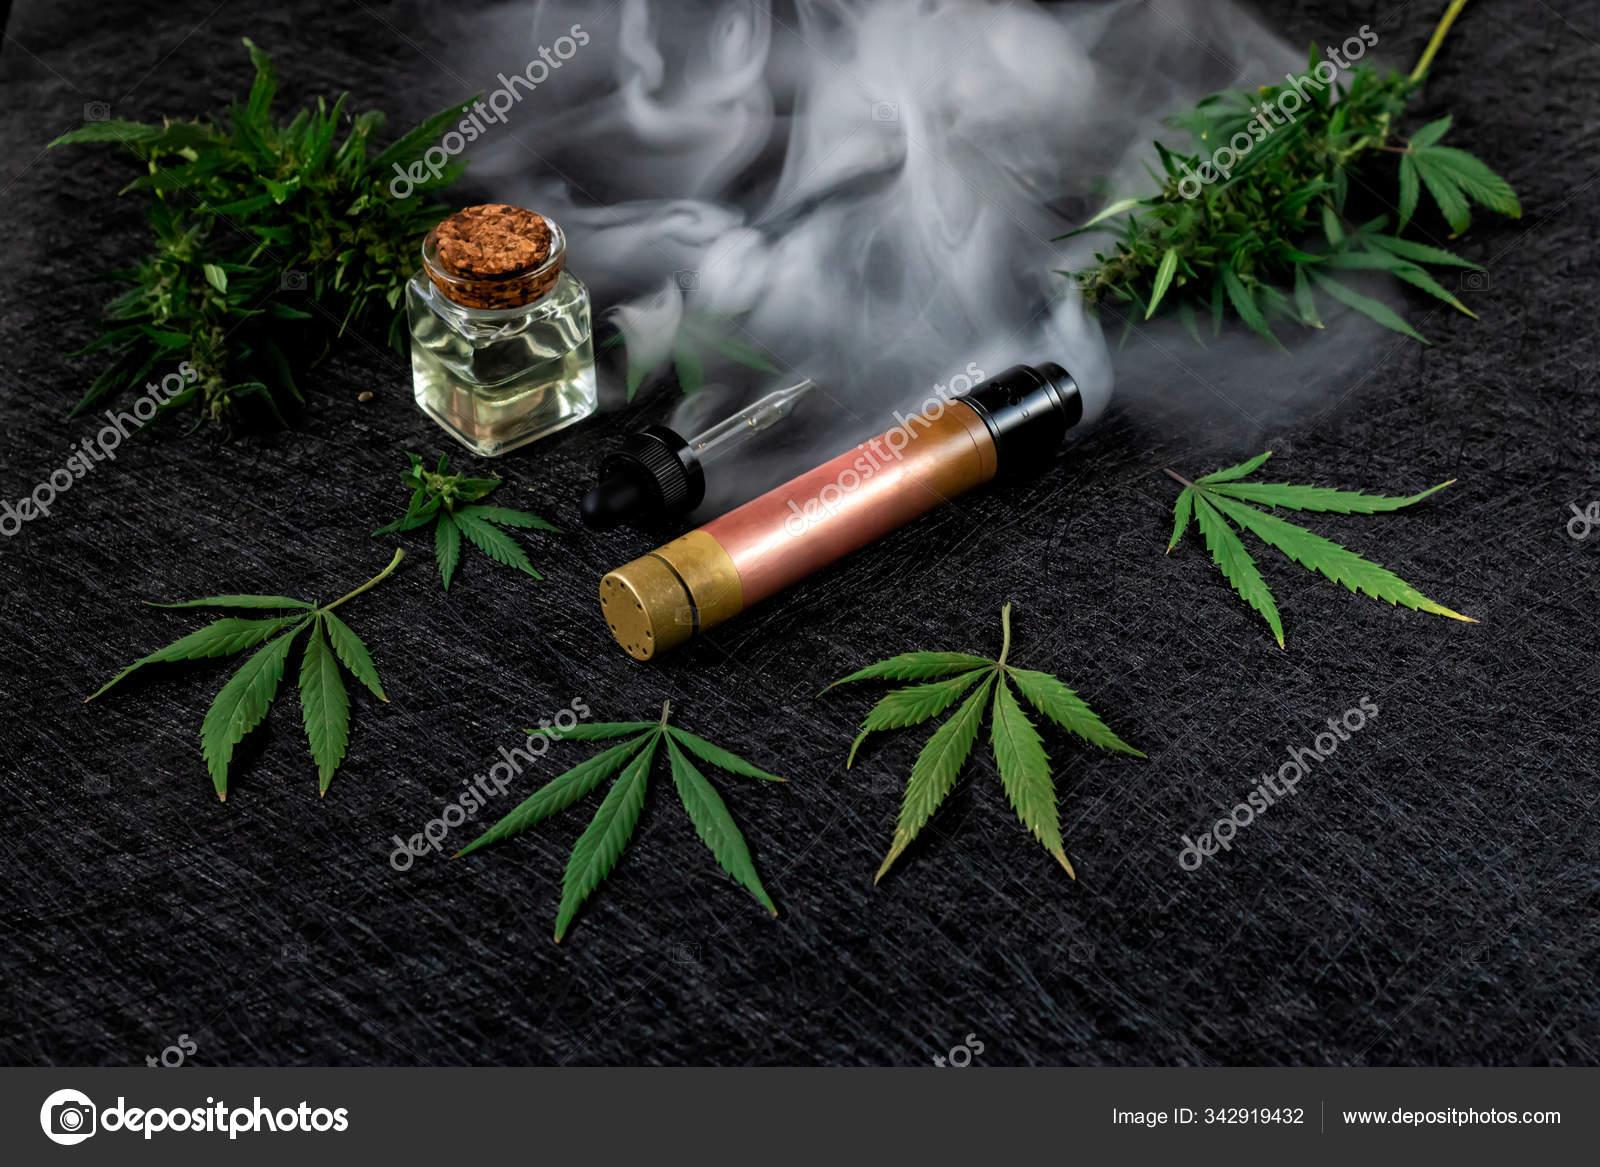 Cannabis Liquid Vape Cbd Or Thc Vaping Marijuana And Hemp Against A Dark Background Thick Steam Stock Photo C Maryka26 Gmail Com 342919432